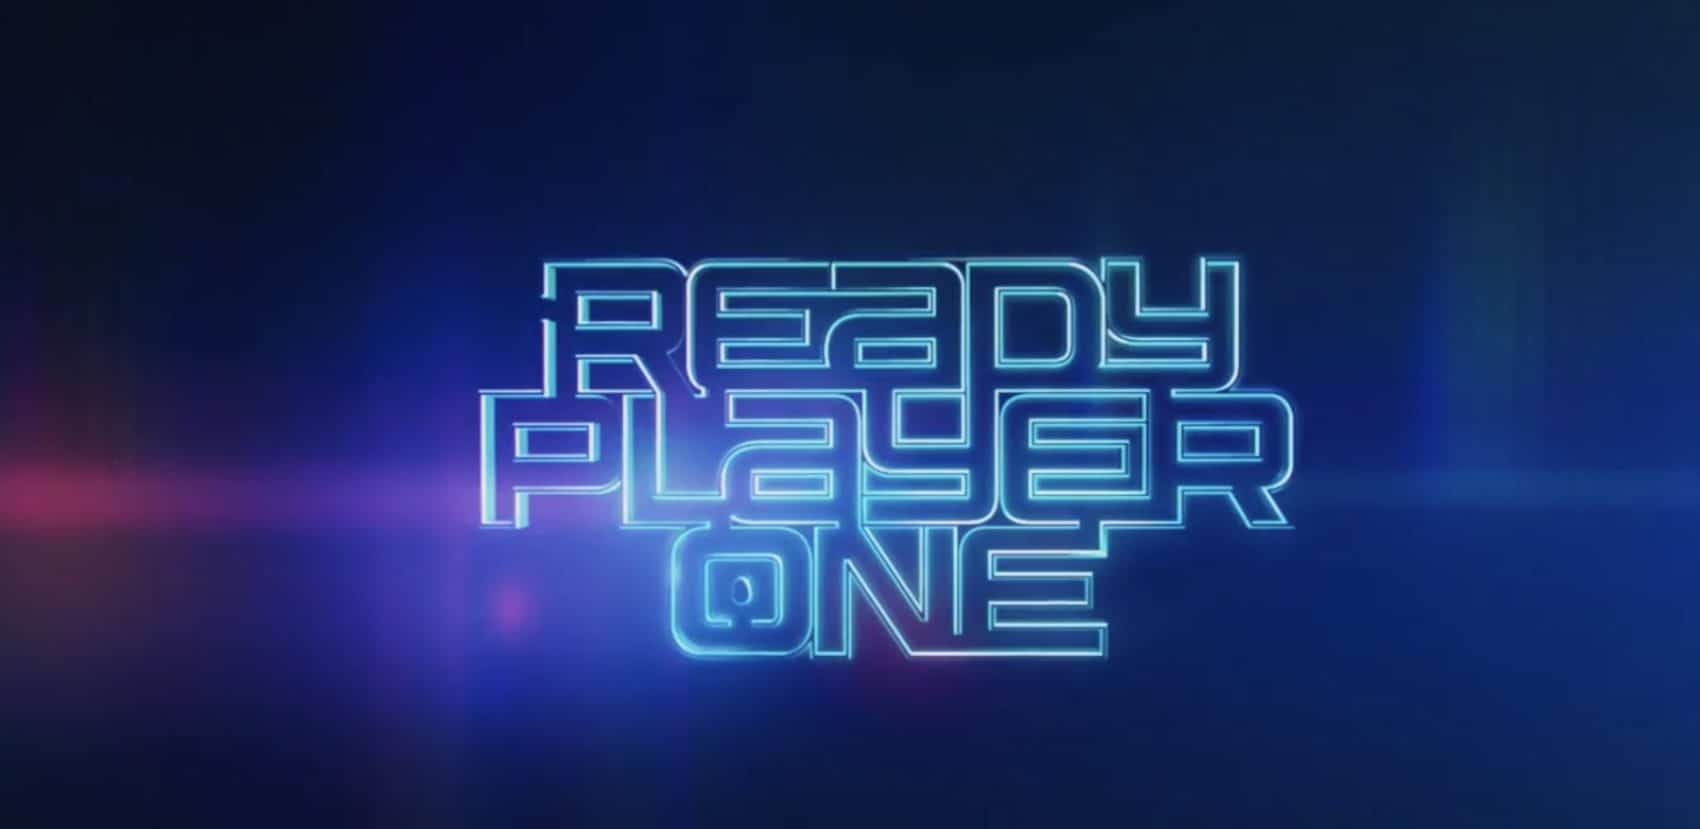 Ready Player One – Contre critique